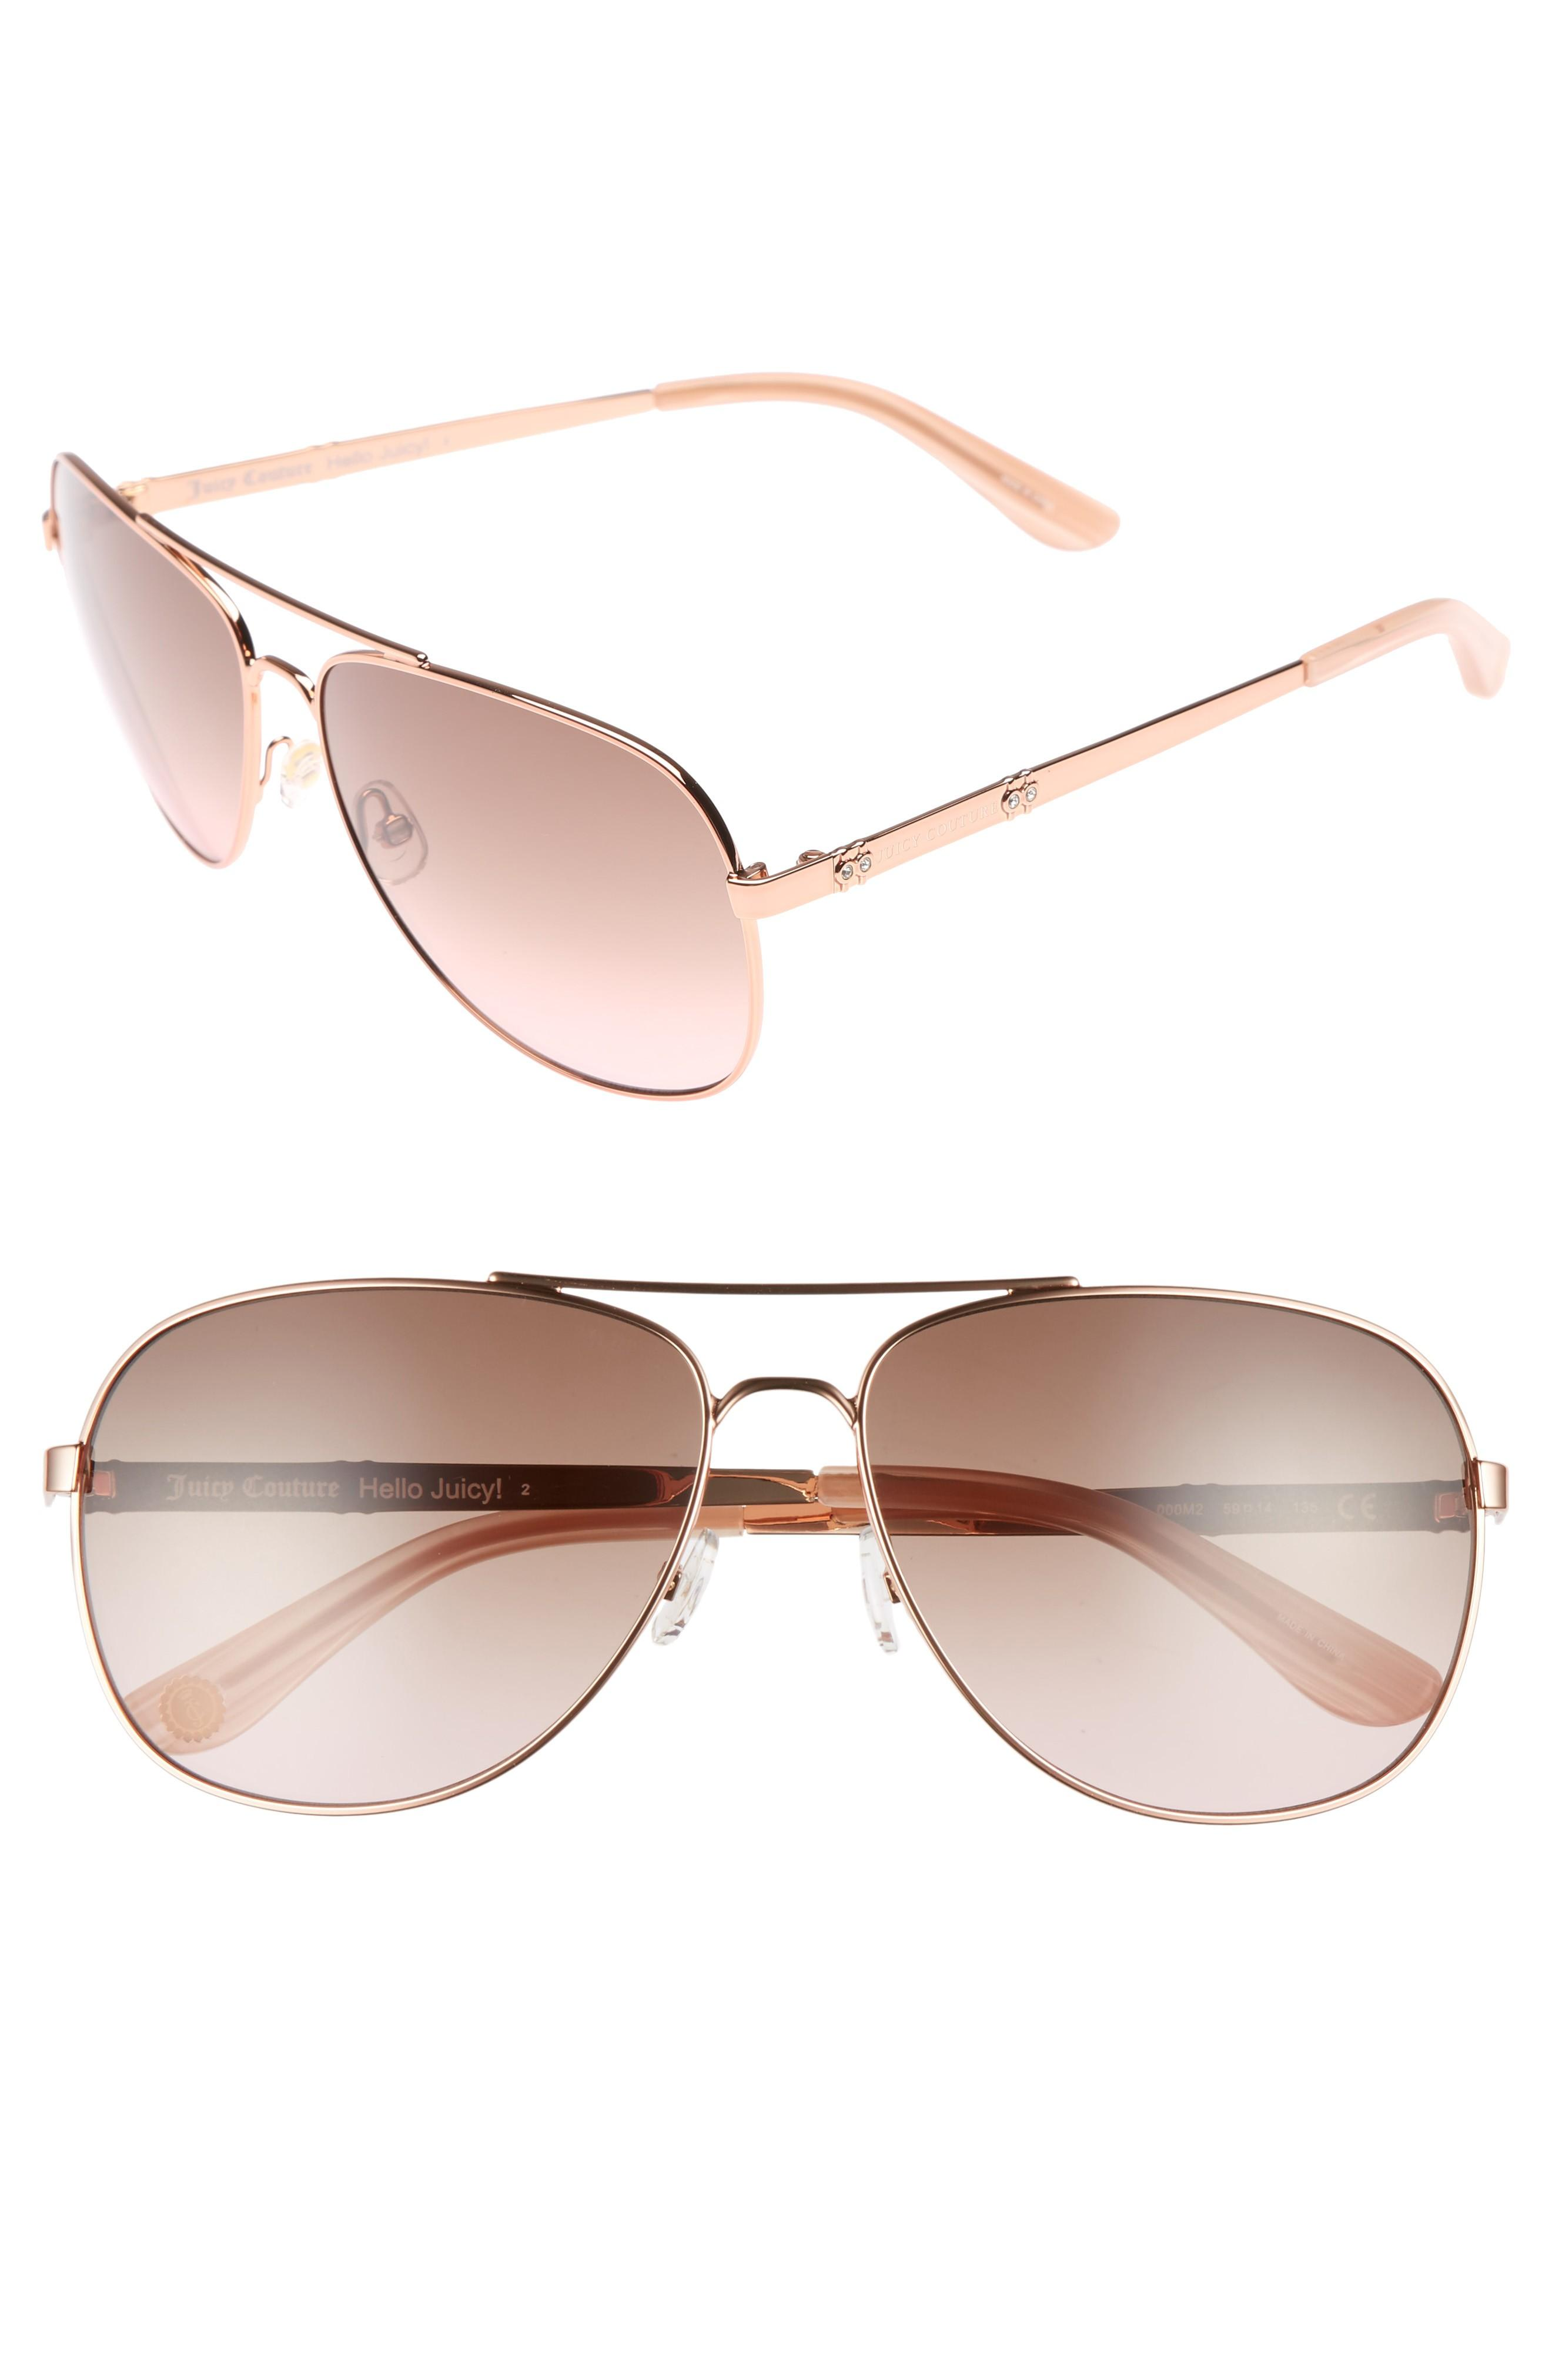 412df1adb4 Juicy Couture Black Label 59Mm Aviator Sunglasses - Rose Gold